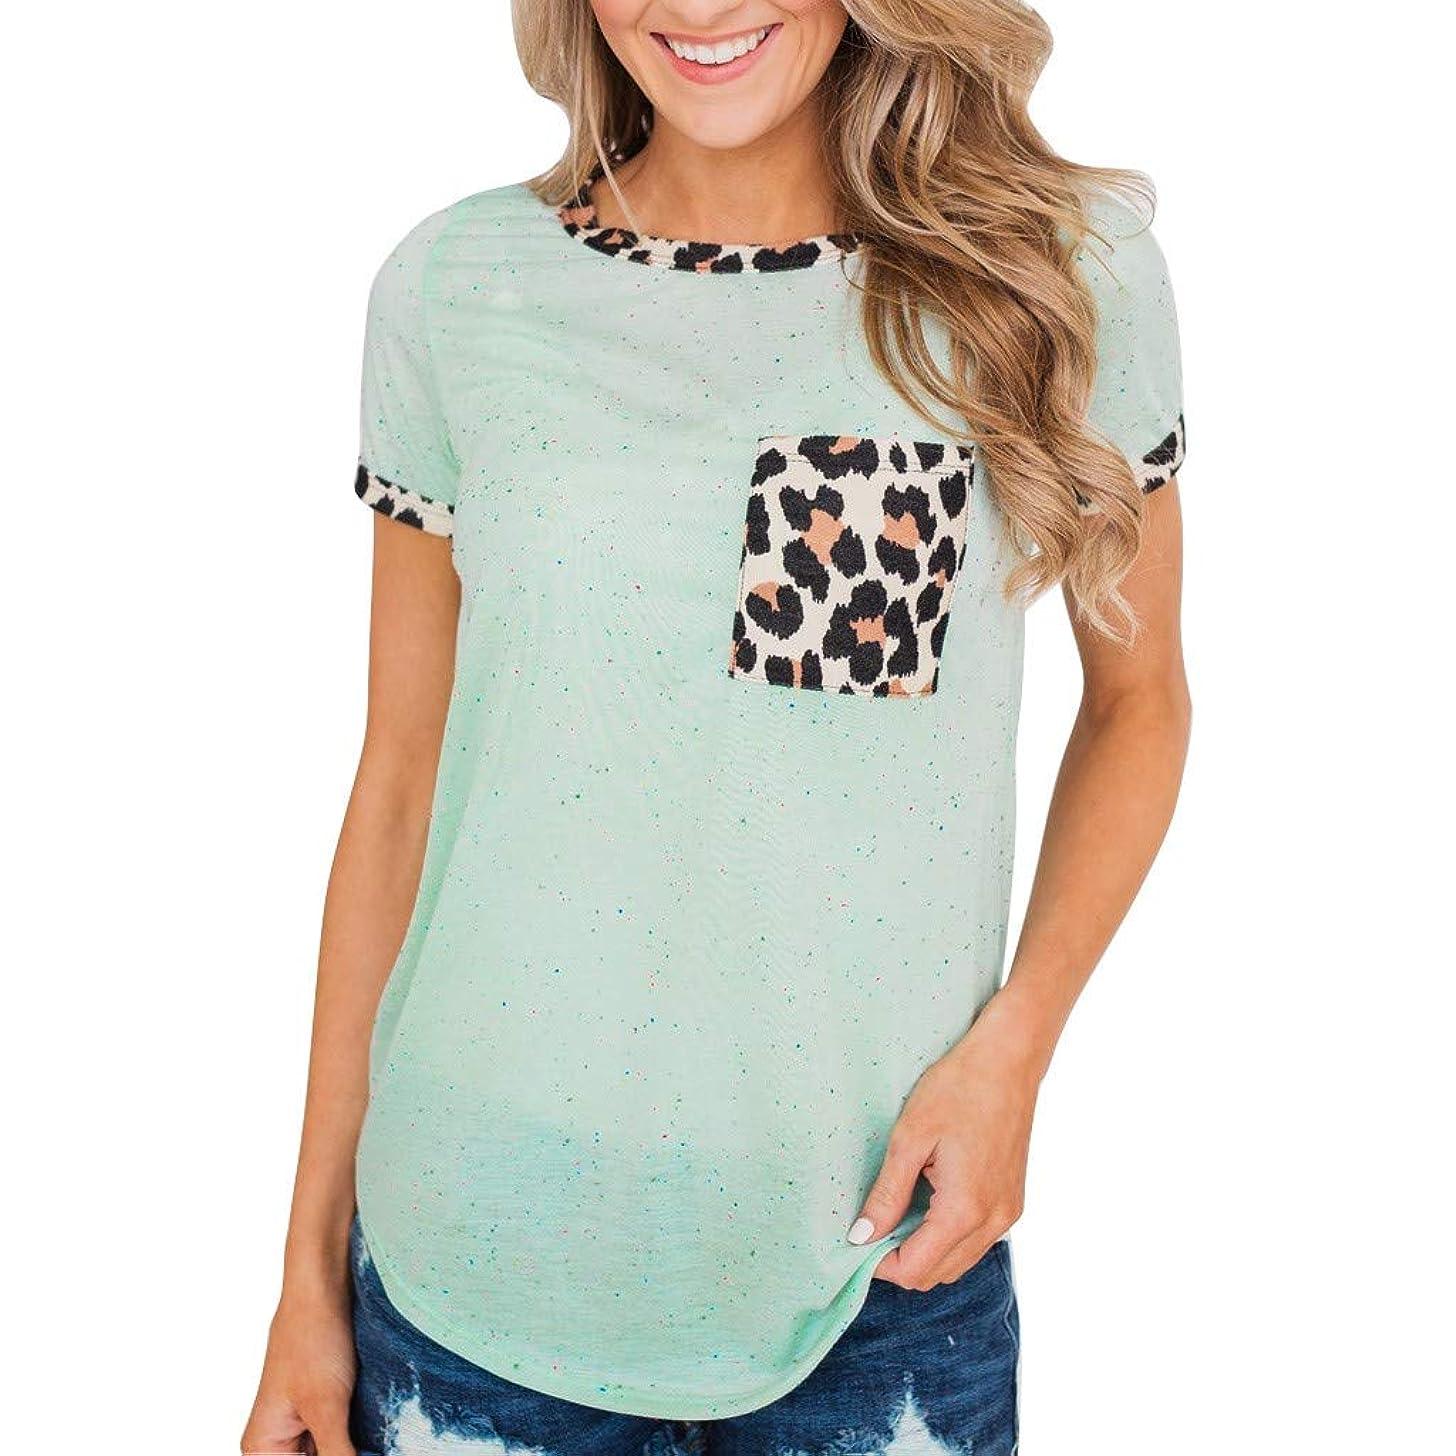 HimTak Women's Short-Sleeve Crewneck T-Shirt Women's Short Sleeve Fashion Dot Leopard Pocket Casual Top